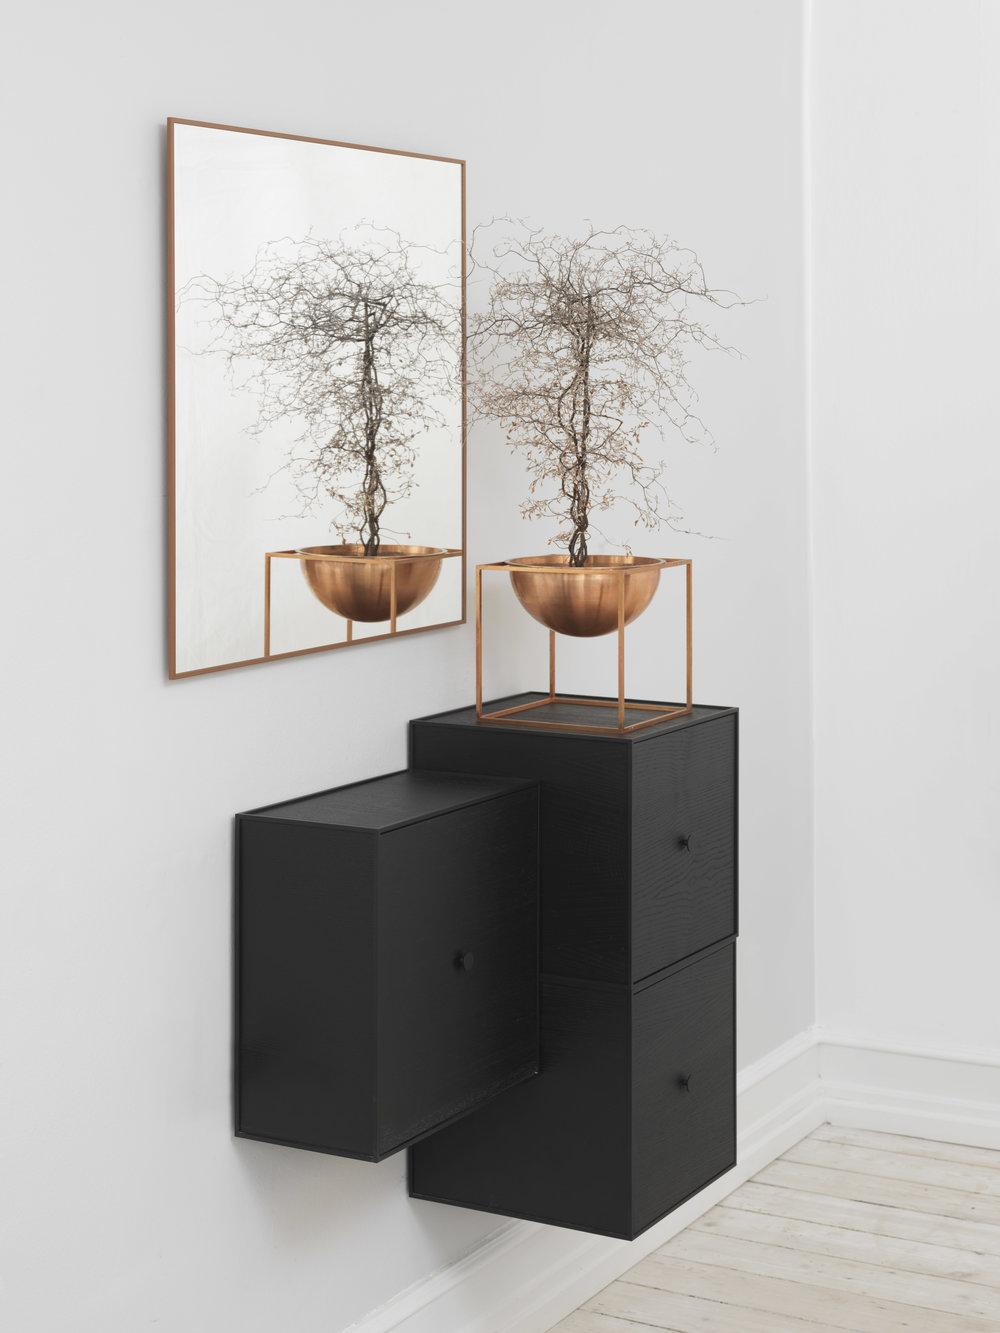 byLassen_Frame_Kubus Bowl copper_View_Lifestyle_High Res.jpg